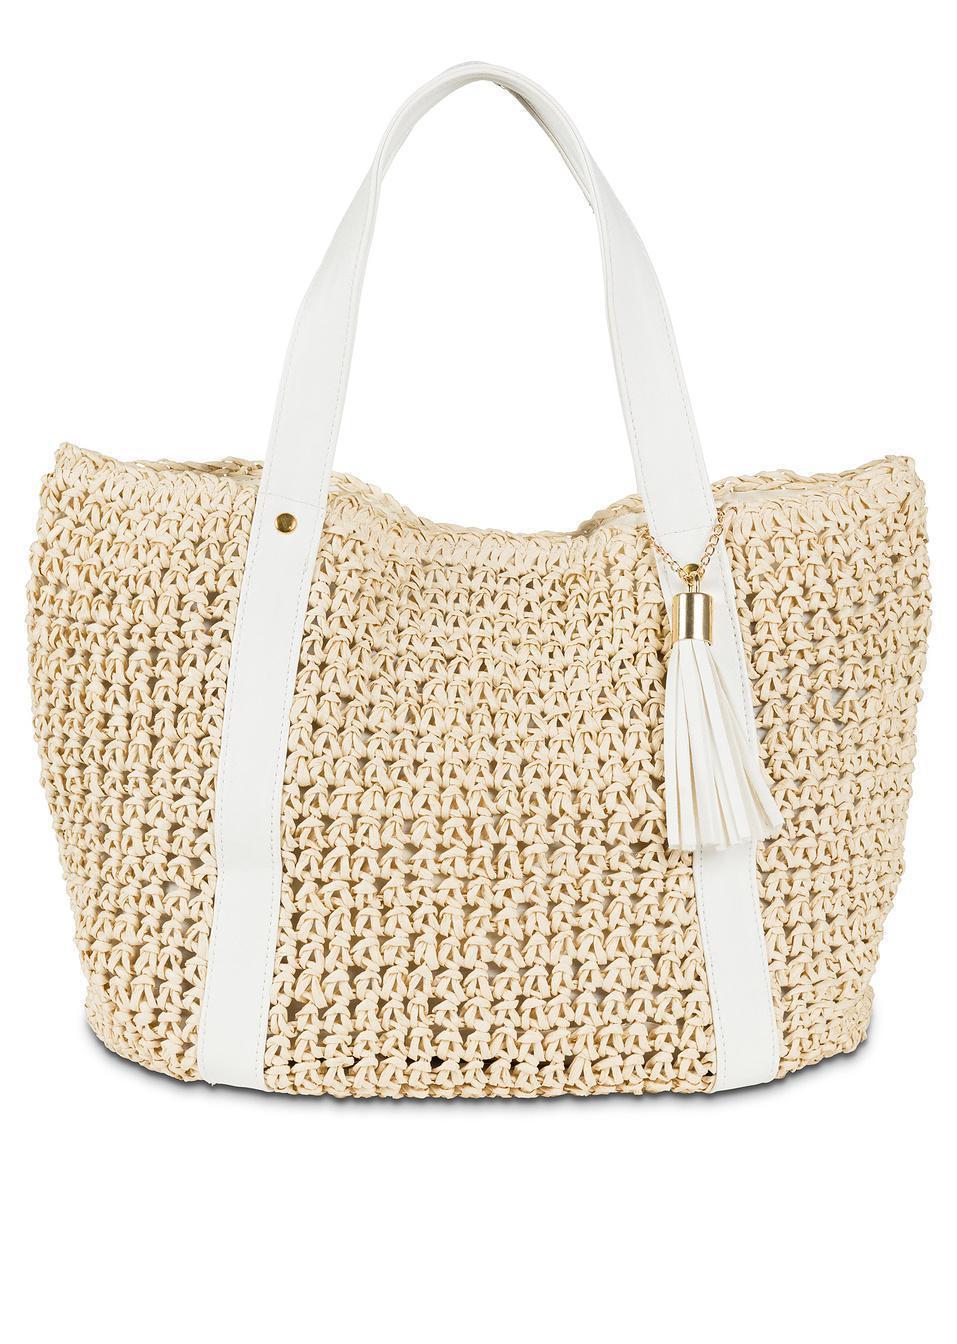 07H087 Плетеная сумка __uniwersal